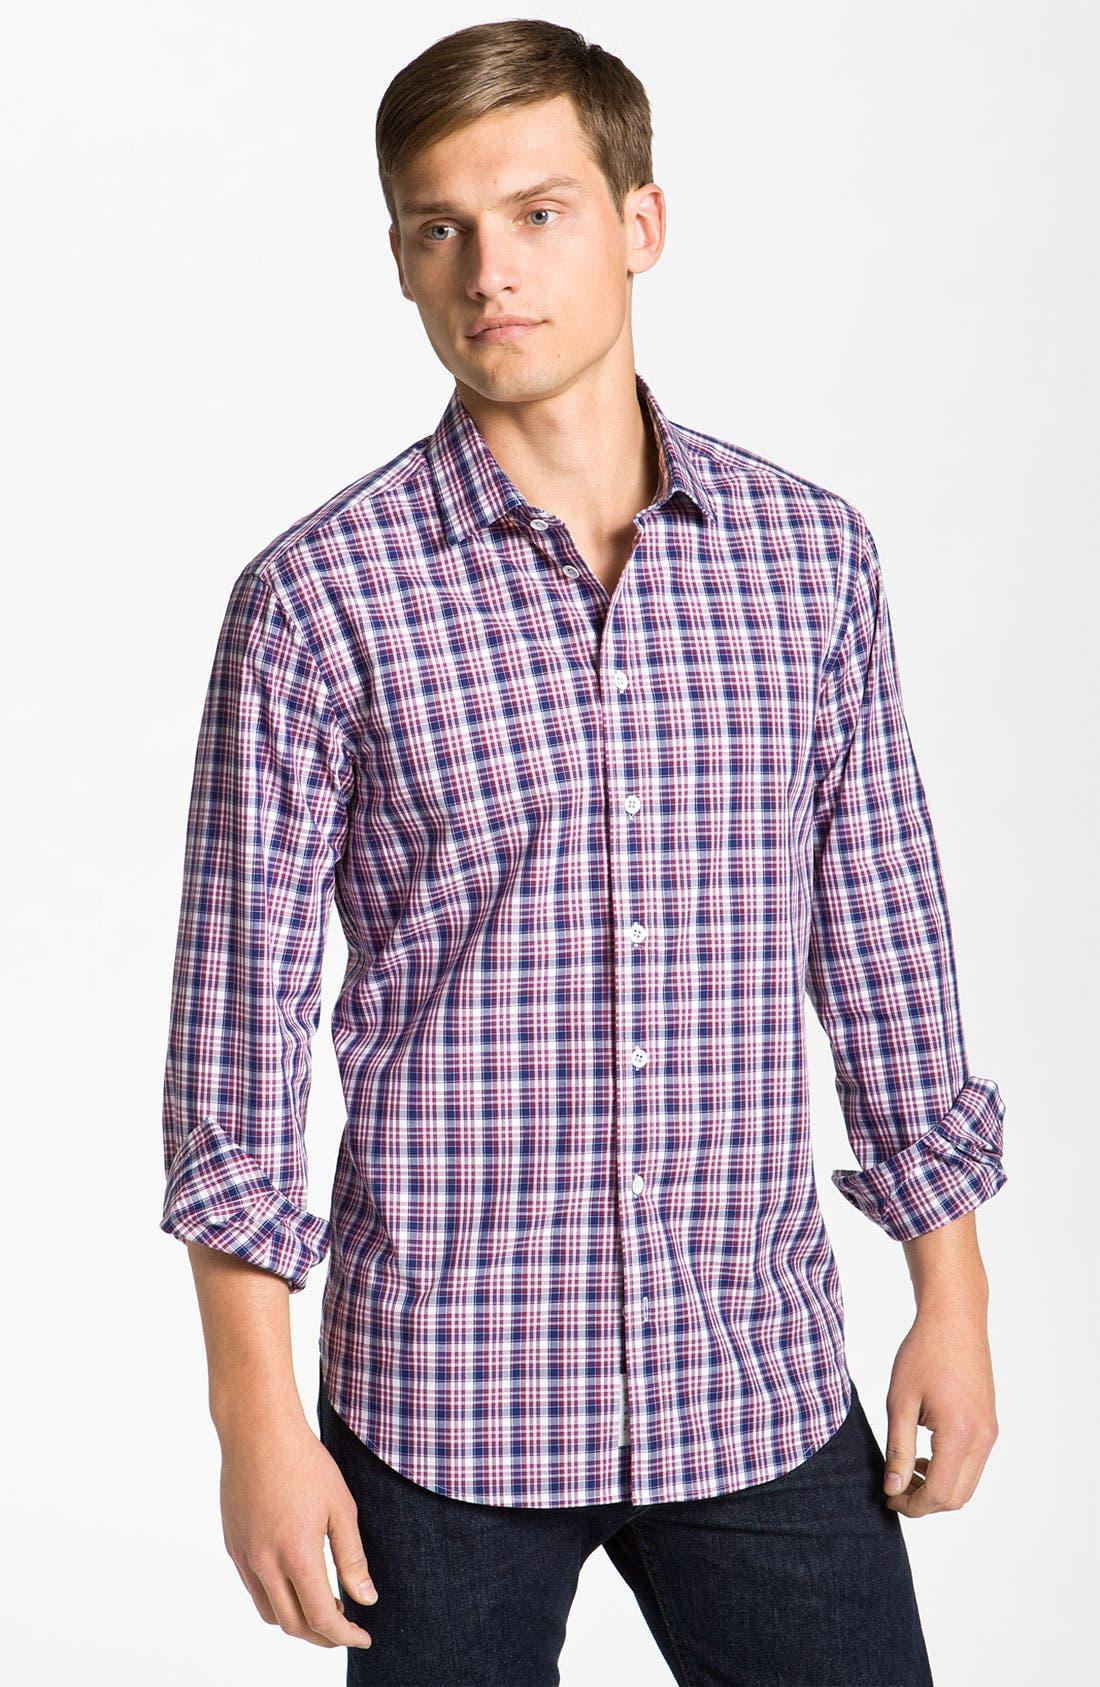 Main Image - rag & bone 'Charles' Plaid Woven Shirt